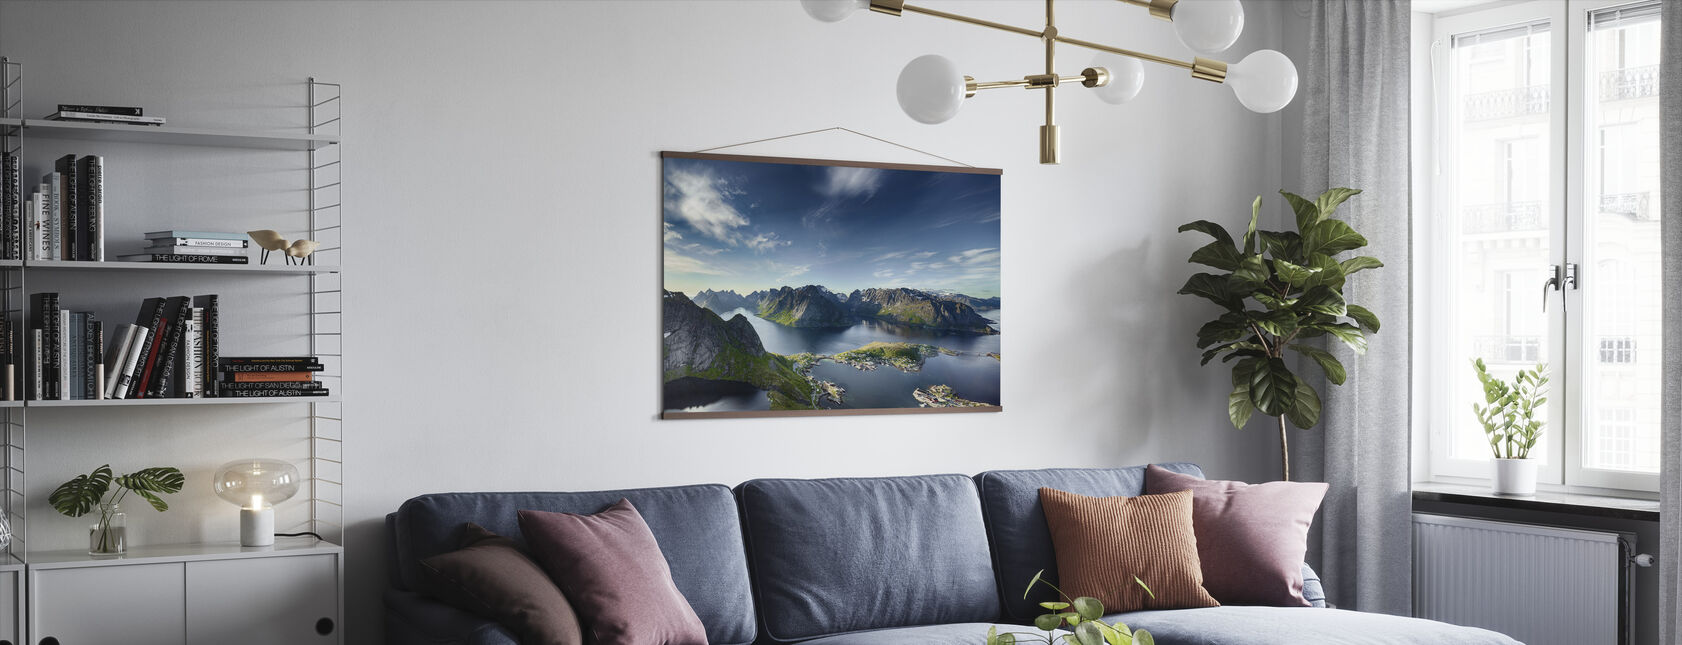 Panoramautsikt över Reine i Lofoten, Norge - Poster - Vardagsrum